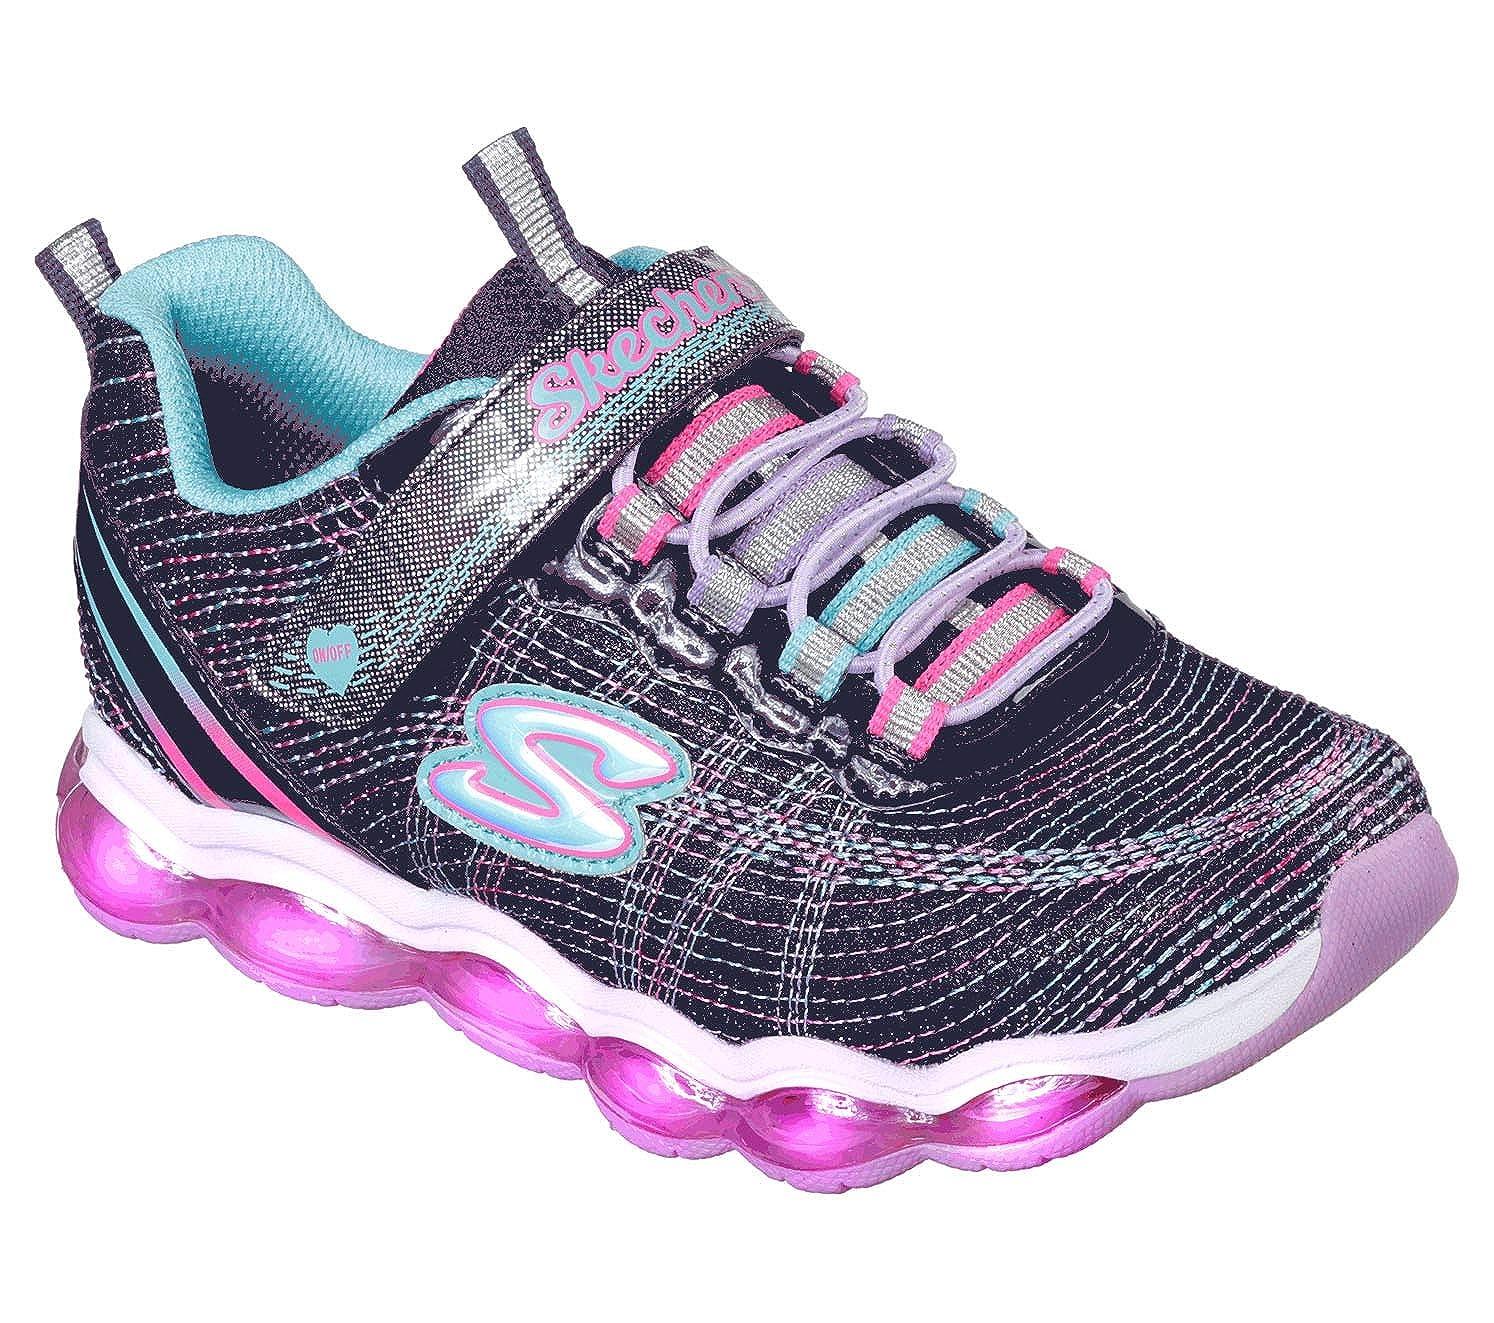 Skechers Girls Glimmer Lights Sneakers